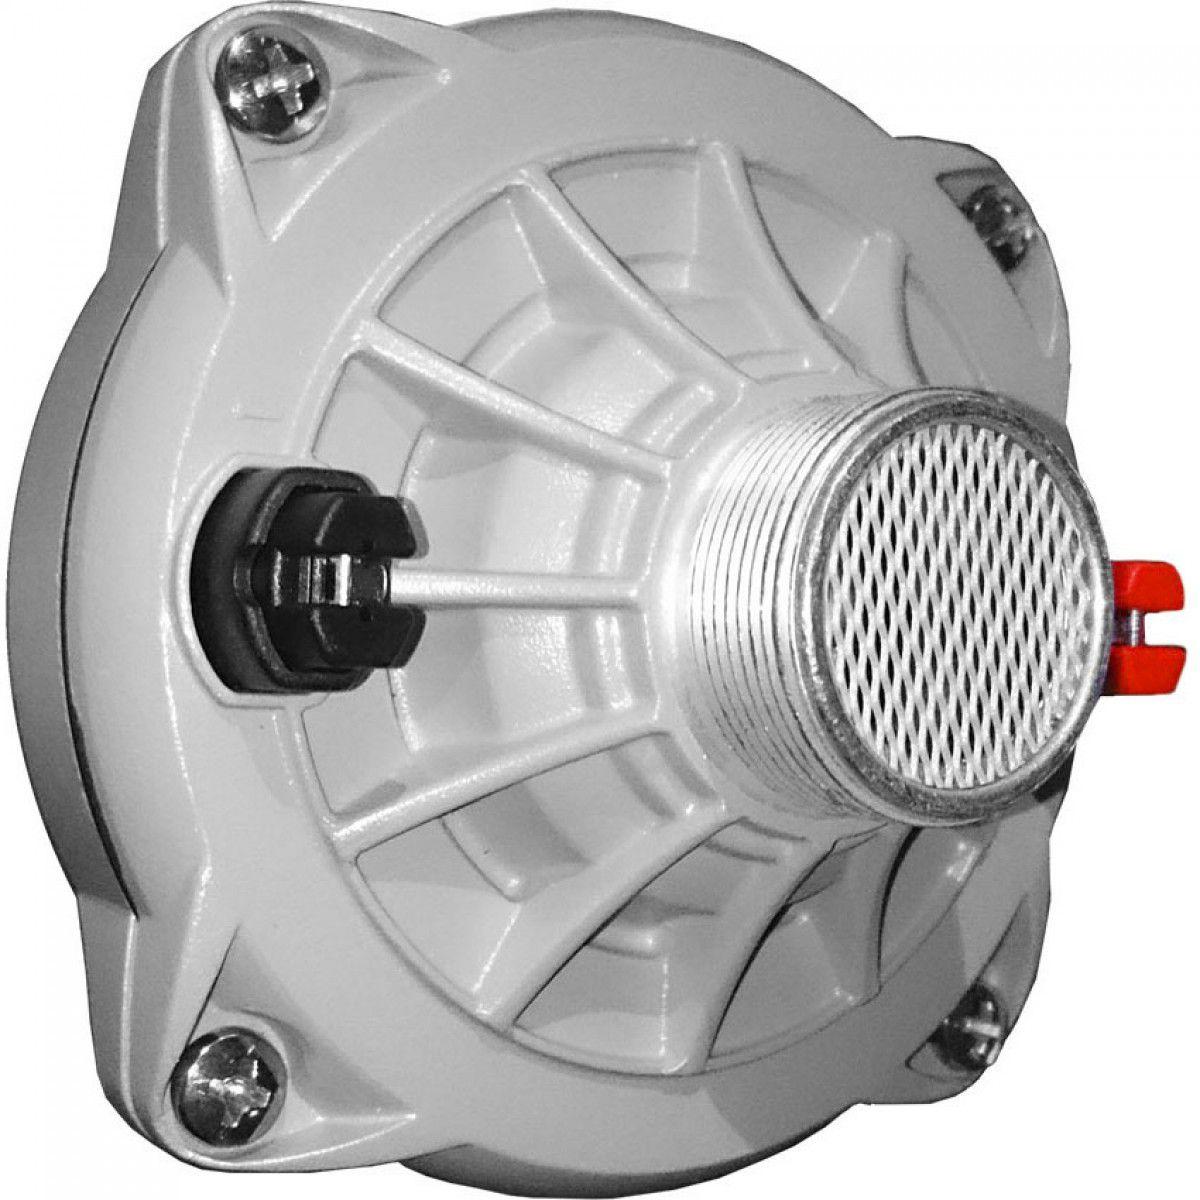 Driver JBL Selenium 100W RMS 8 Ohms D250X